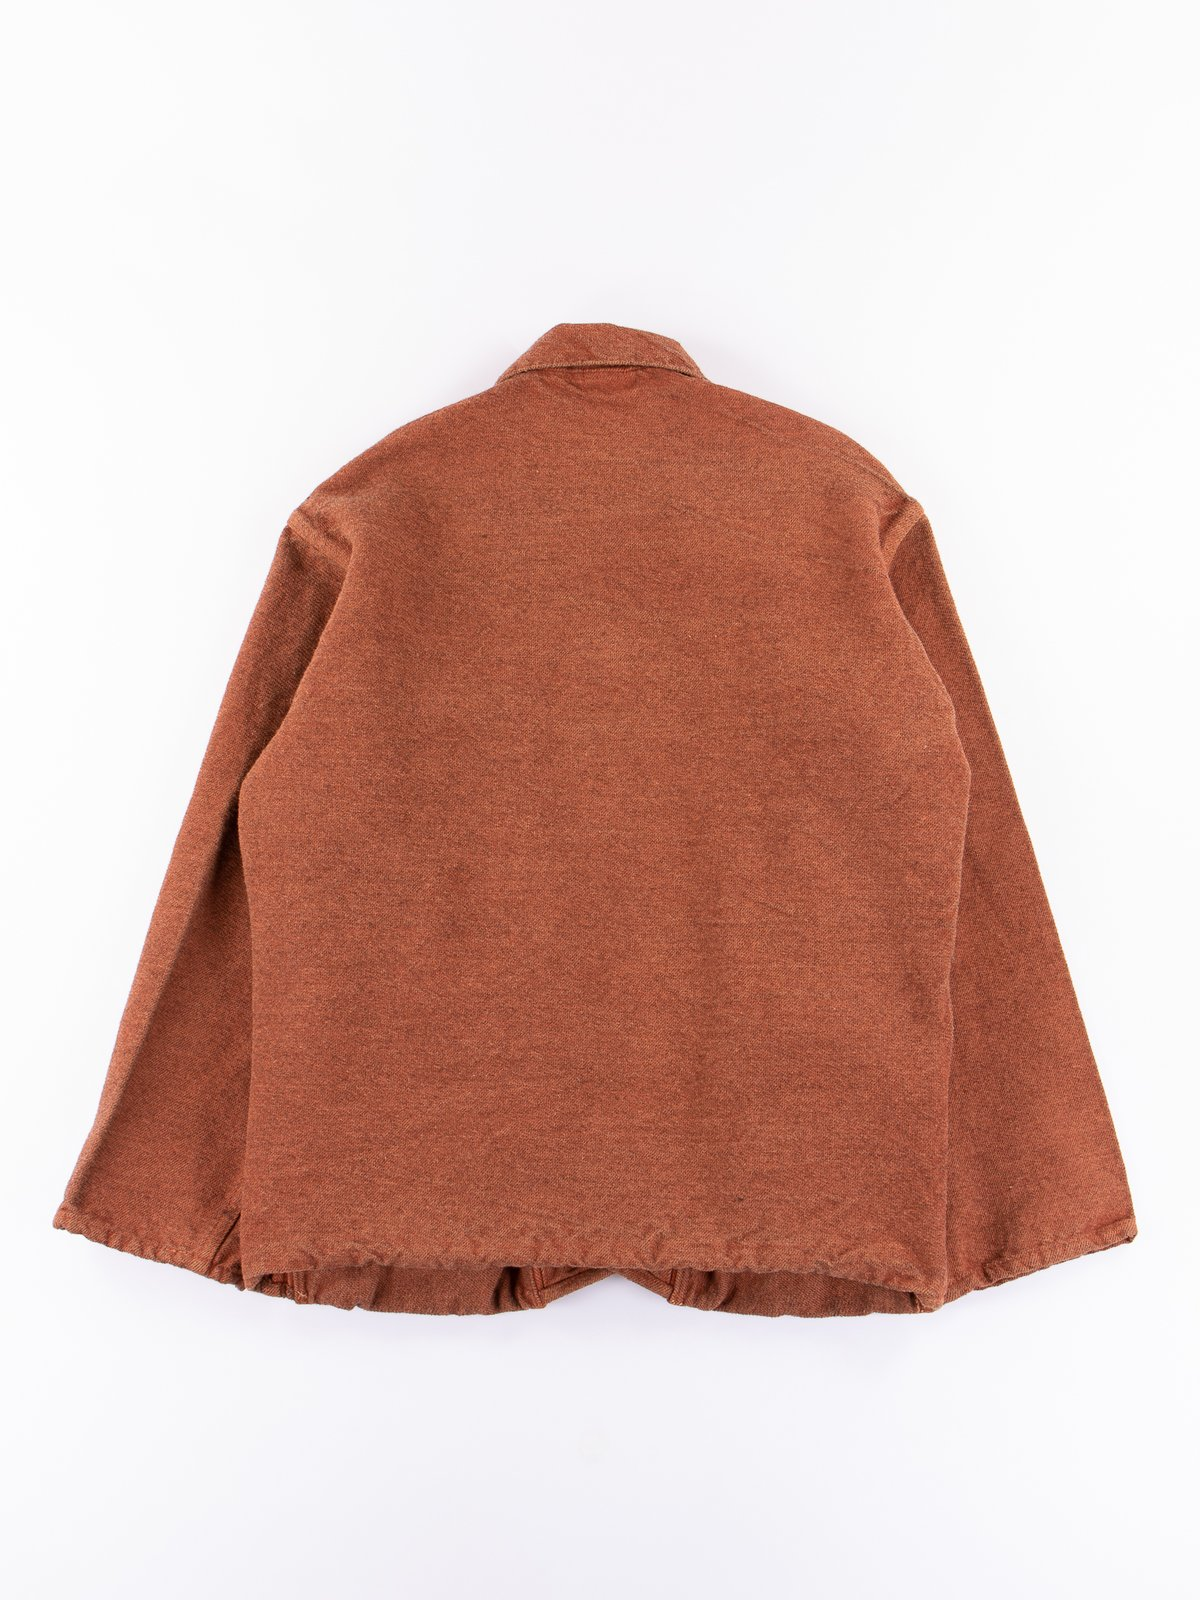 Red Ochre Dye Collared Shepherd's Coat - Image 6